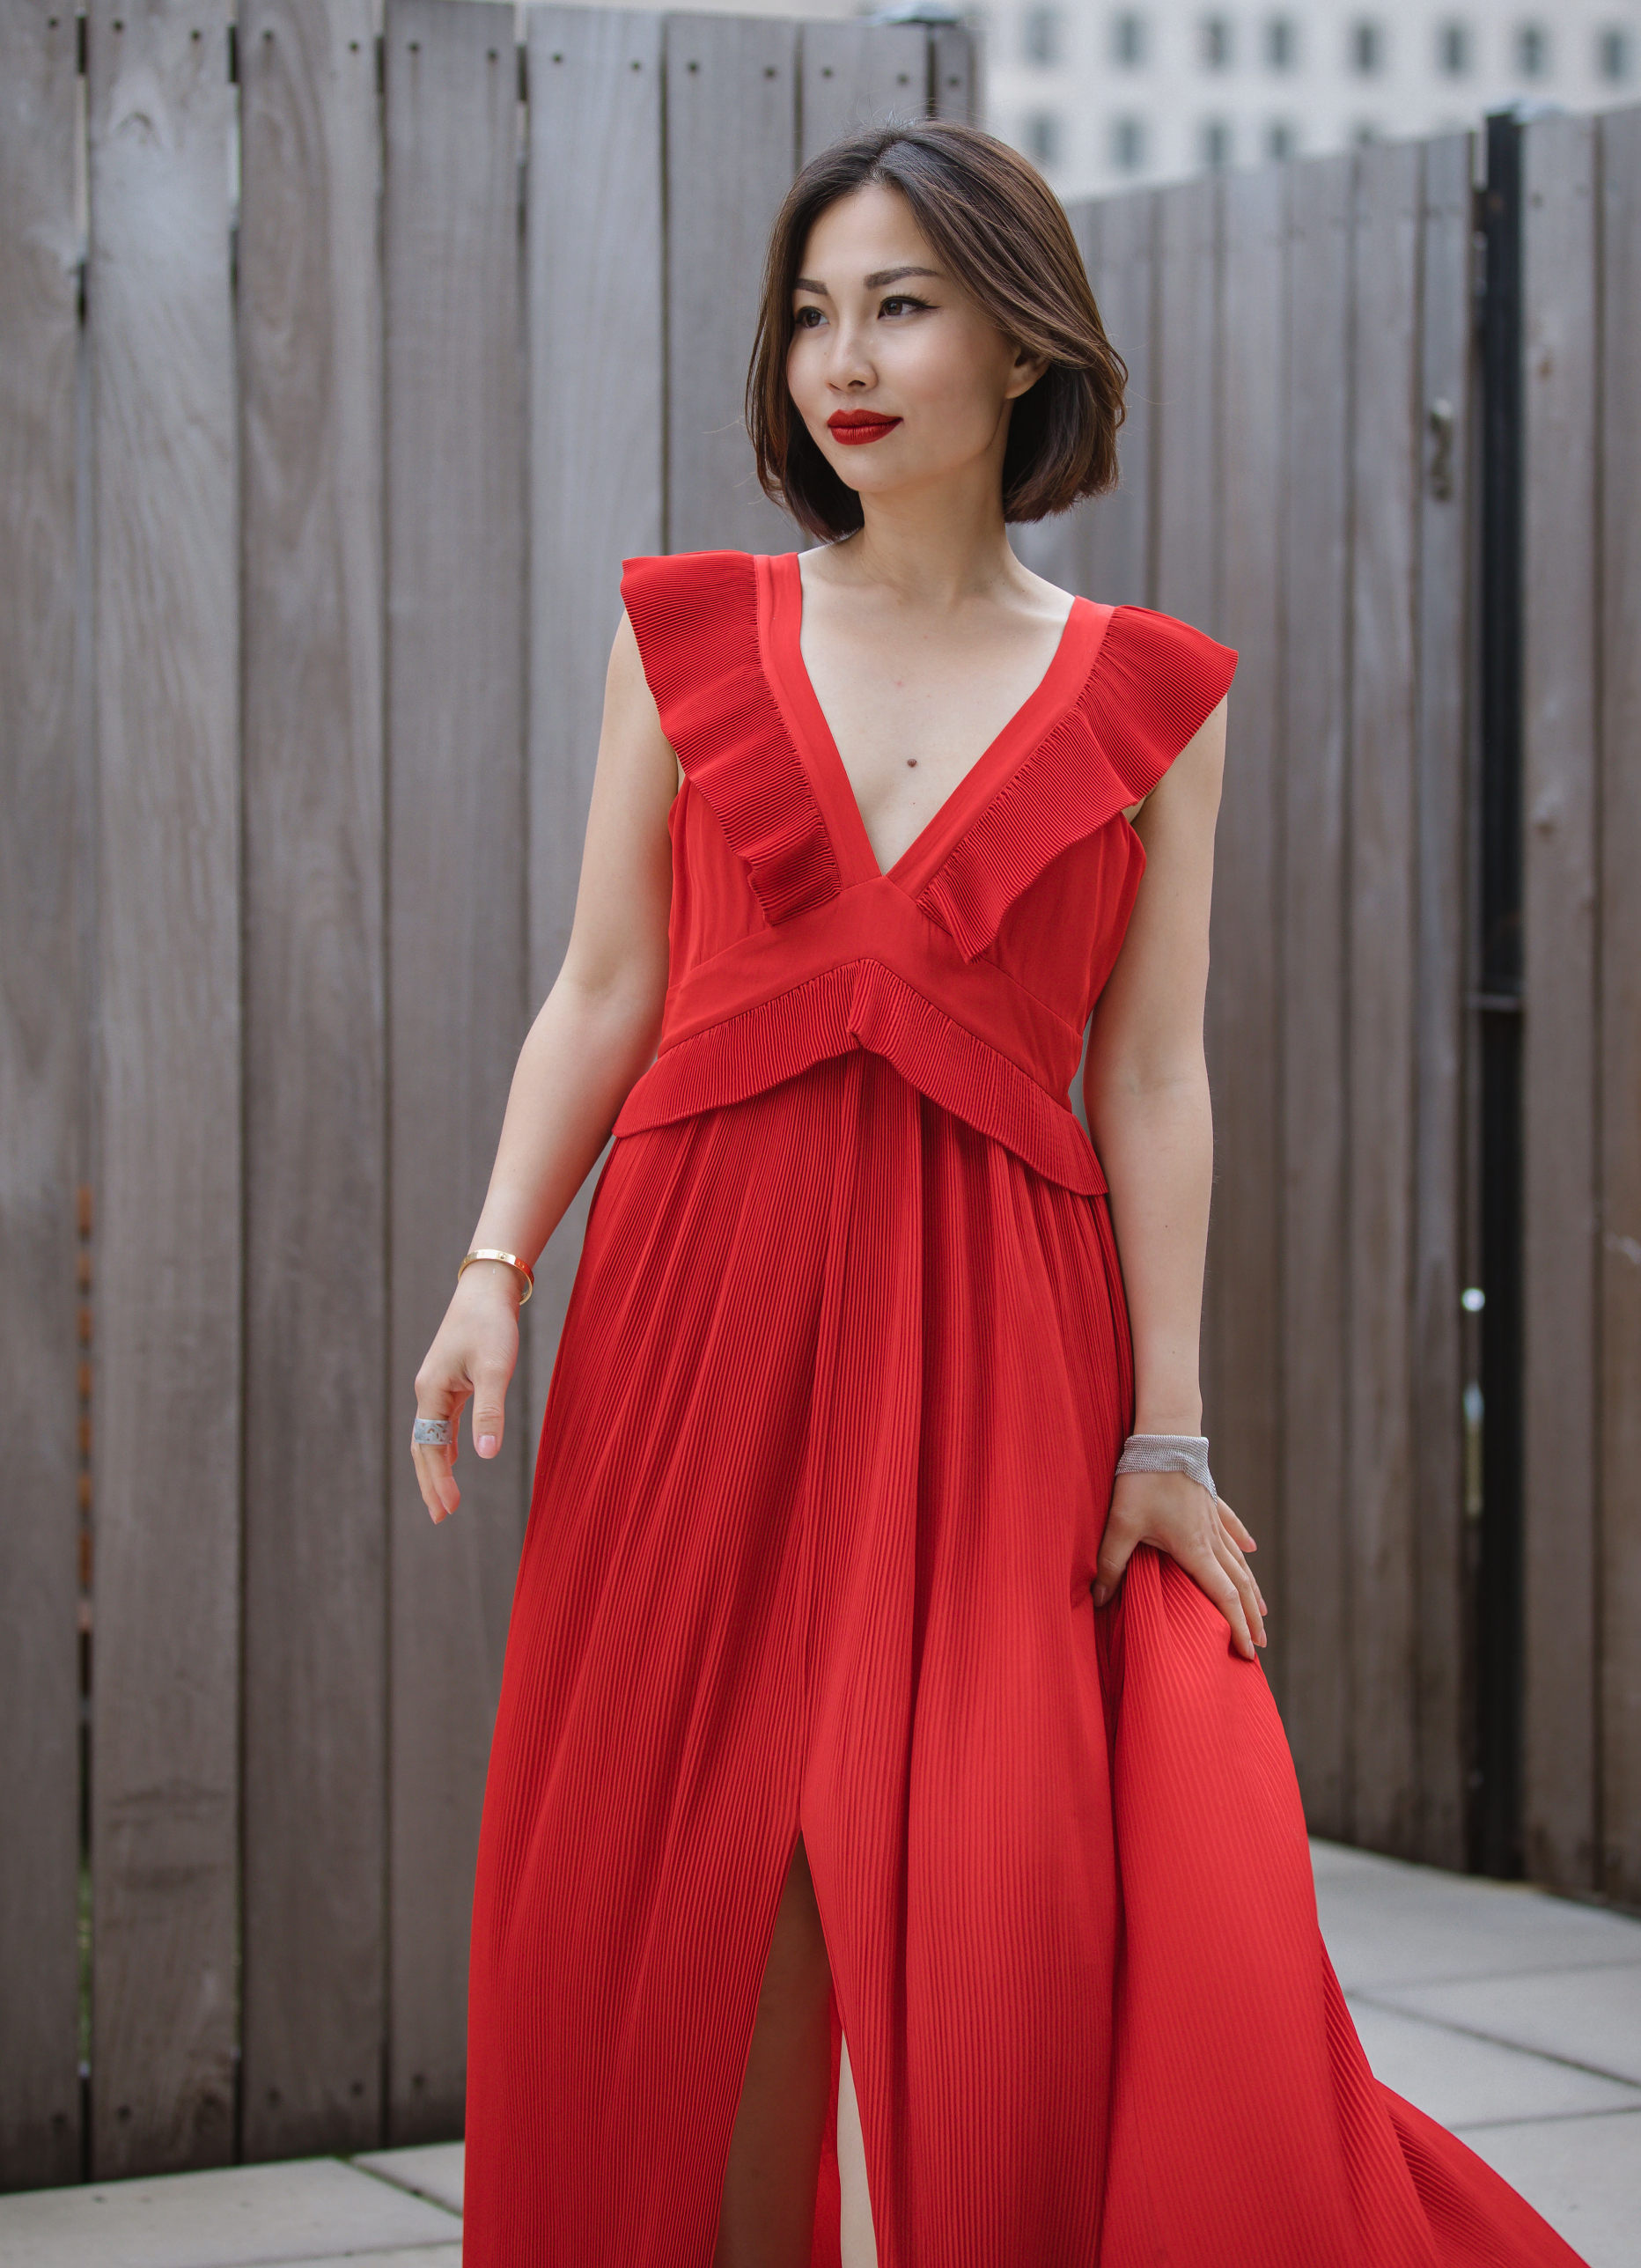 chelsea and walker red dress 4.JPG